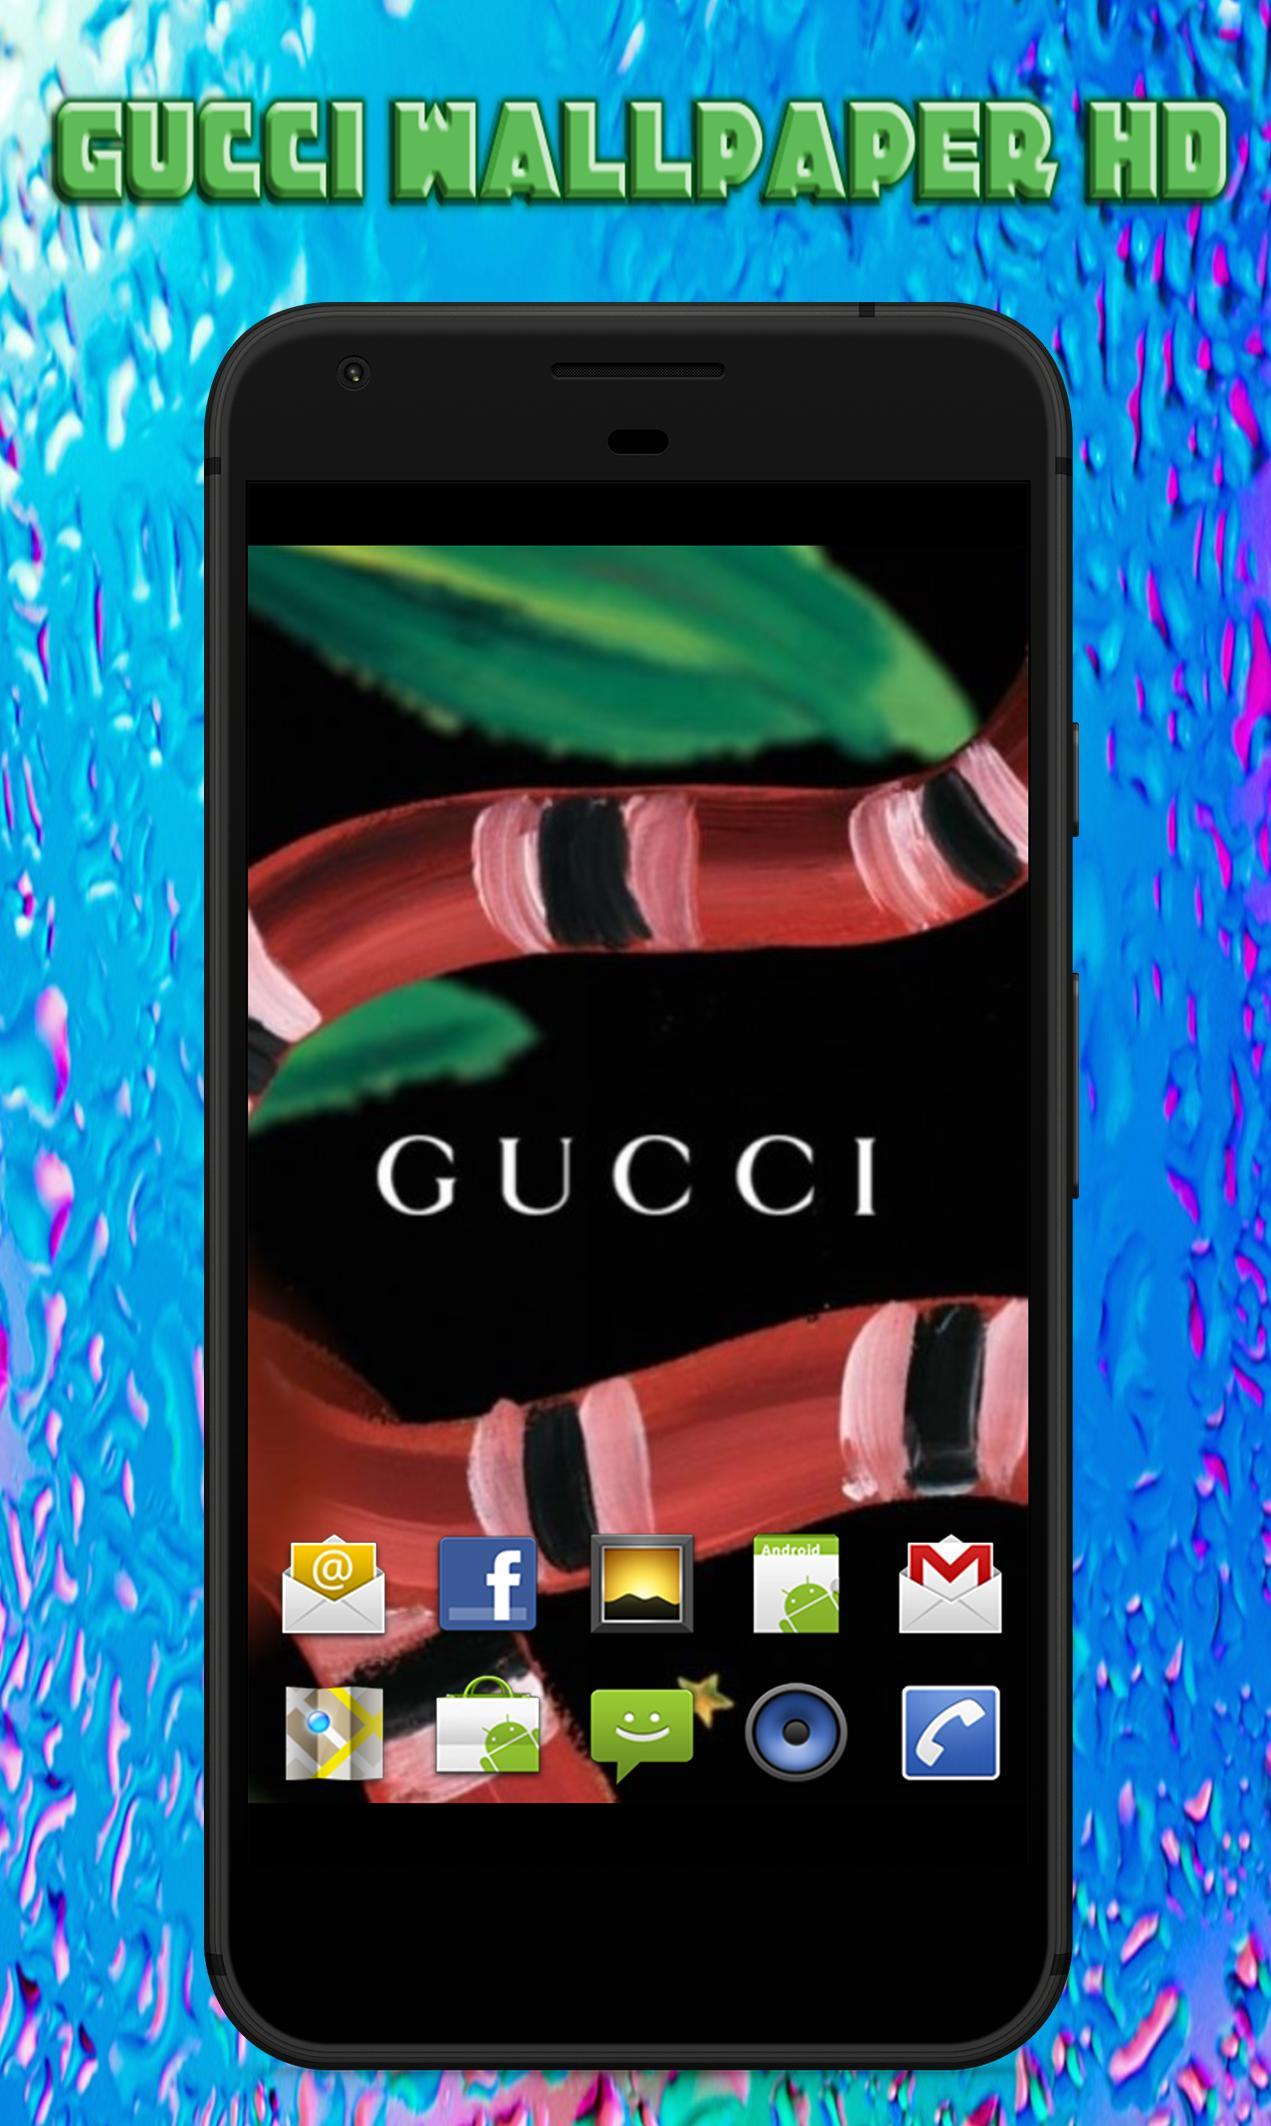 Gucci Wallpaper HD poster